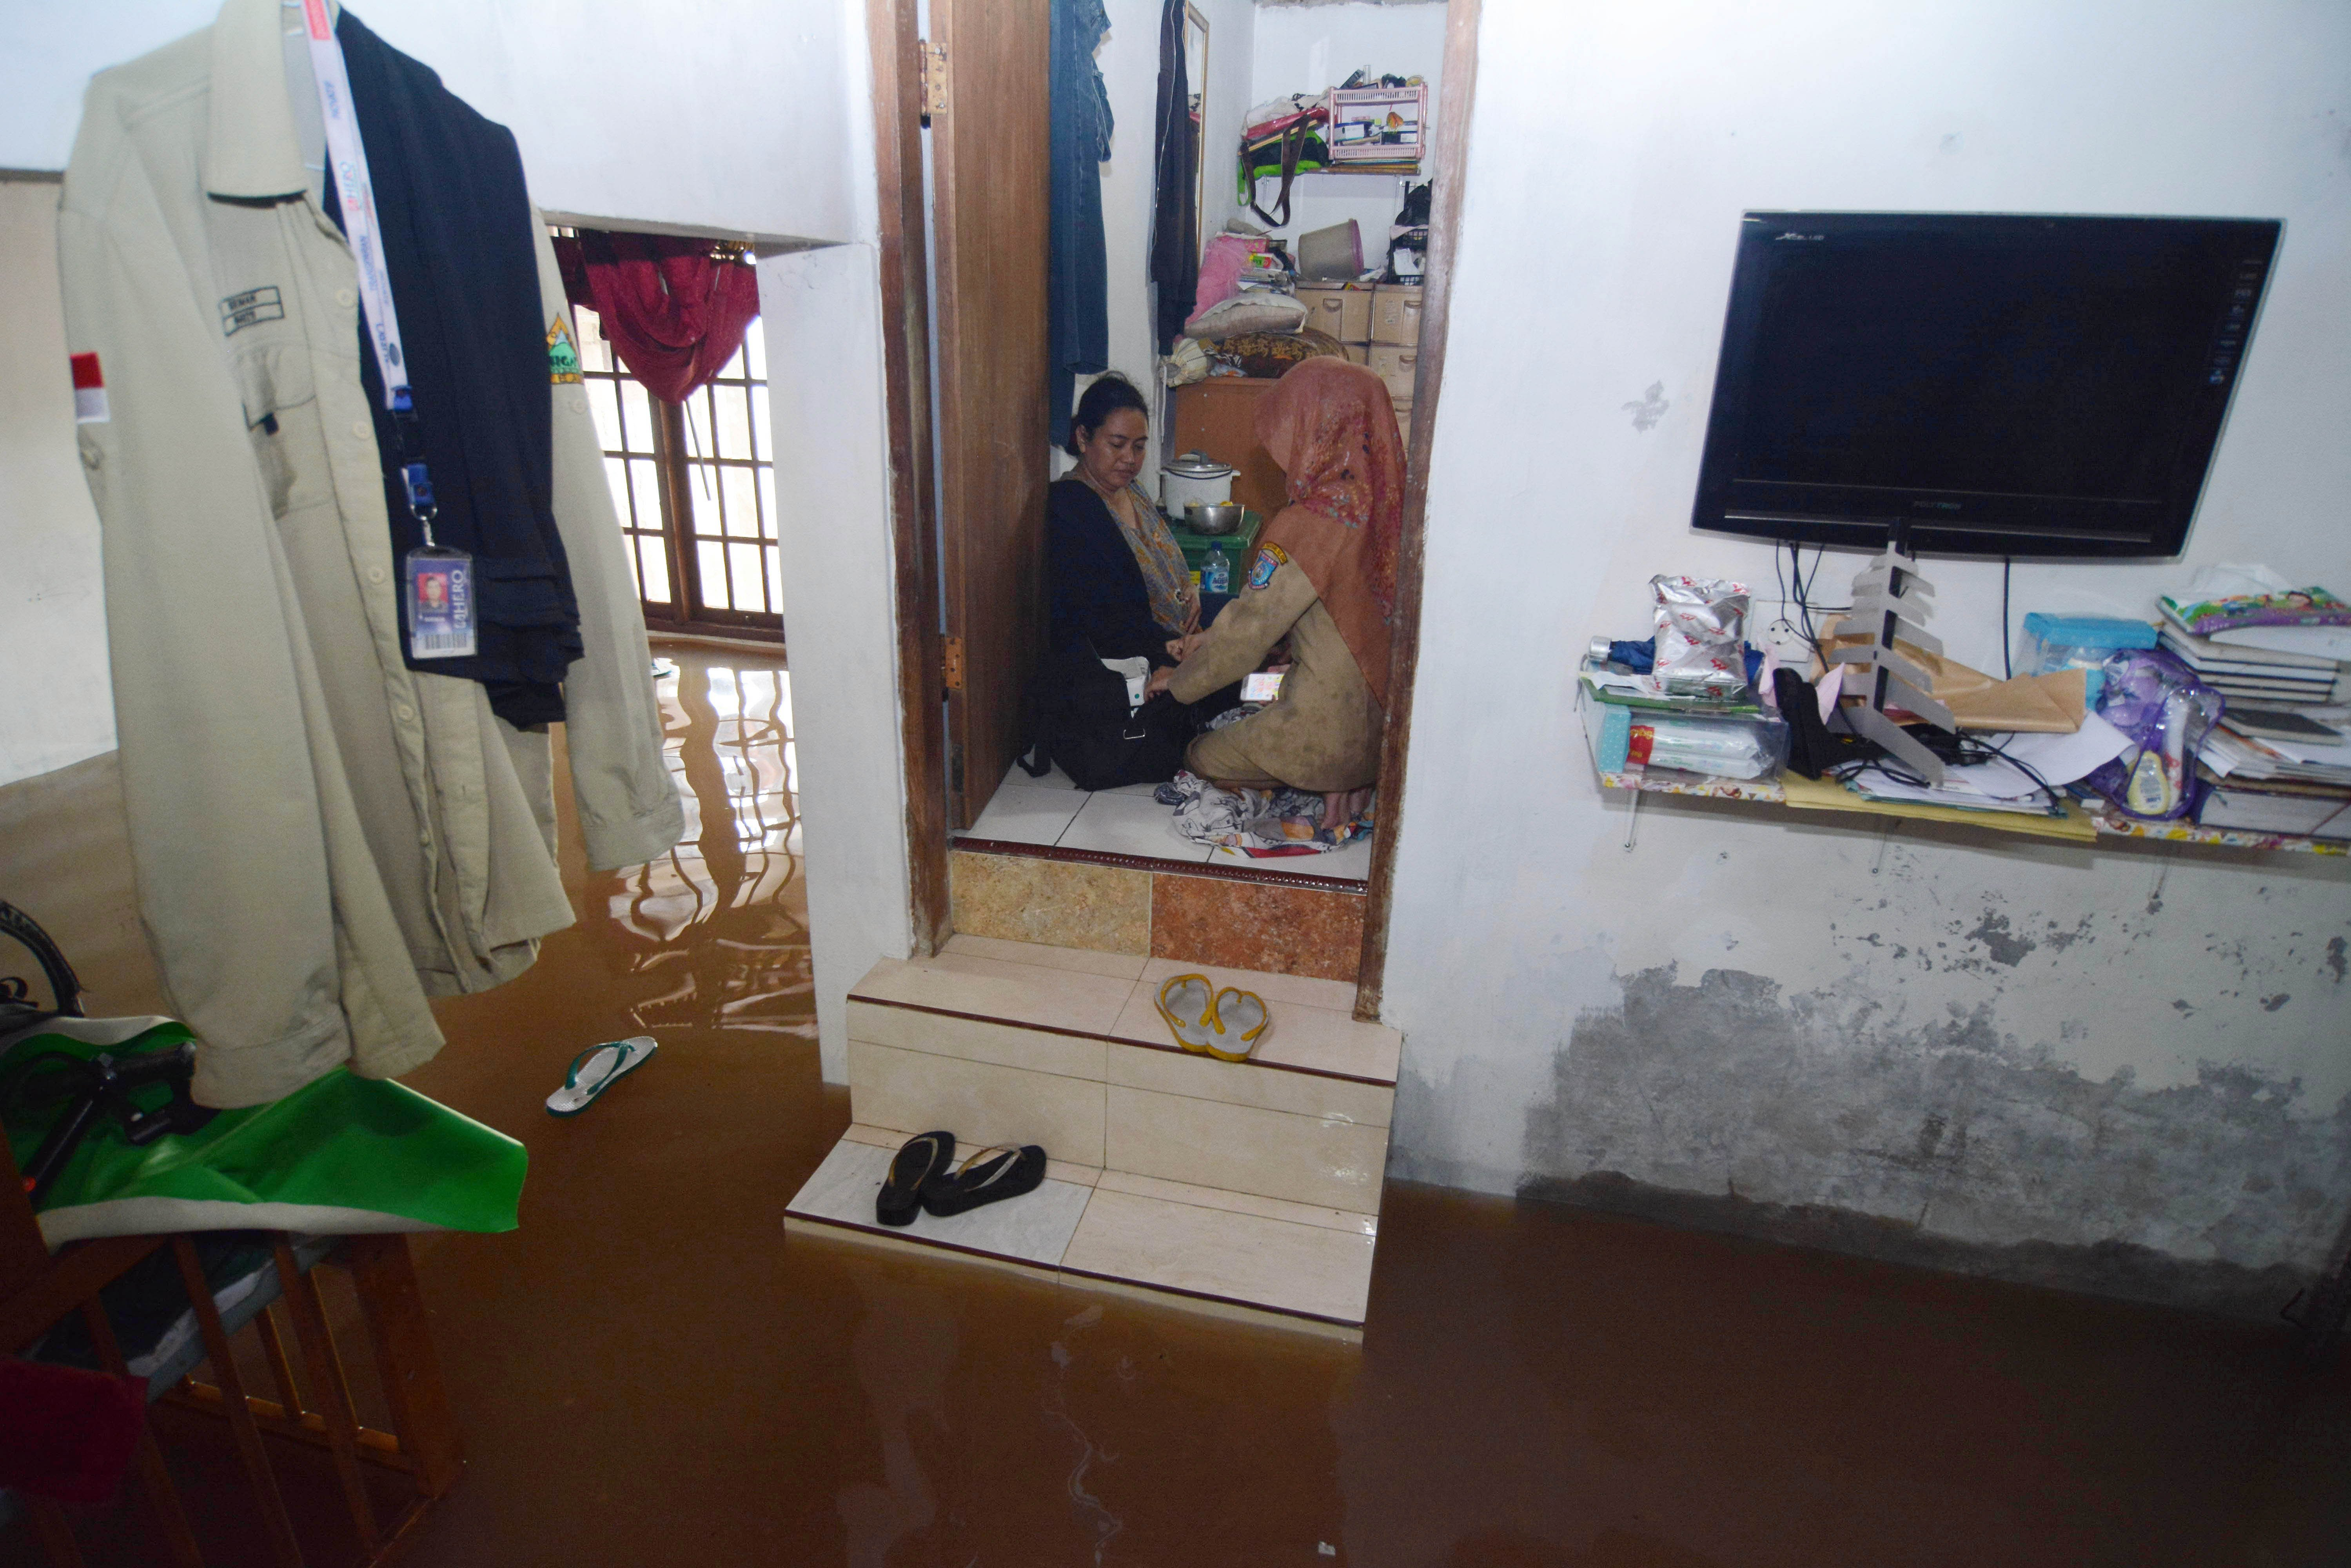 Petugas Puskesmas memeriksa warga yang sakit saat banjir melanda kawasan Perumahan Kampung Bulak, Pondok Aren, Kota Tangerang Selatan, Banten, Selasa (21/2). Meluapnya anak Kali Angke menyebabkan ratusan rumah di Pondok Aren terendam hingga setinggi 70 cm.